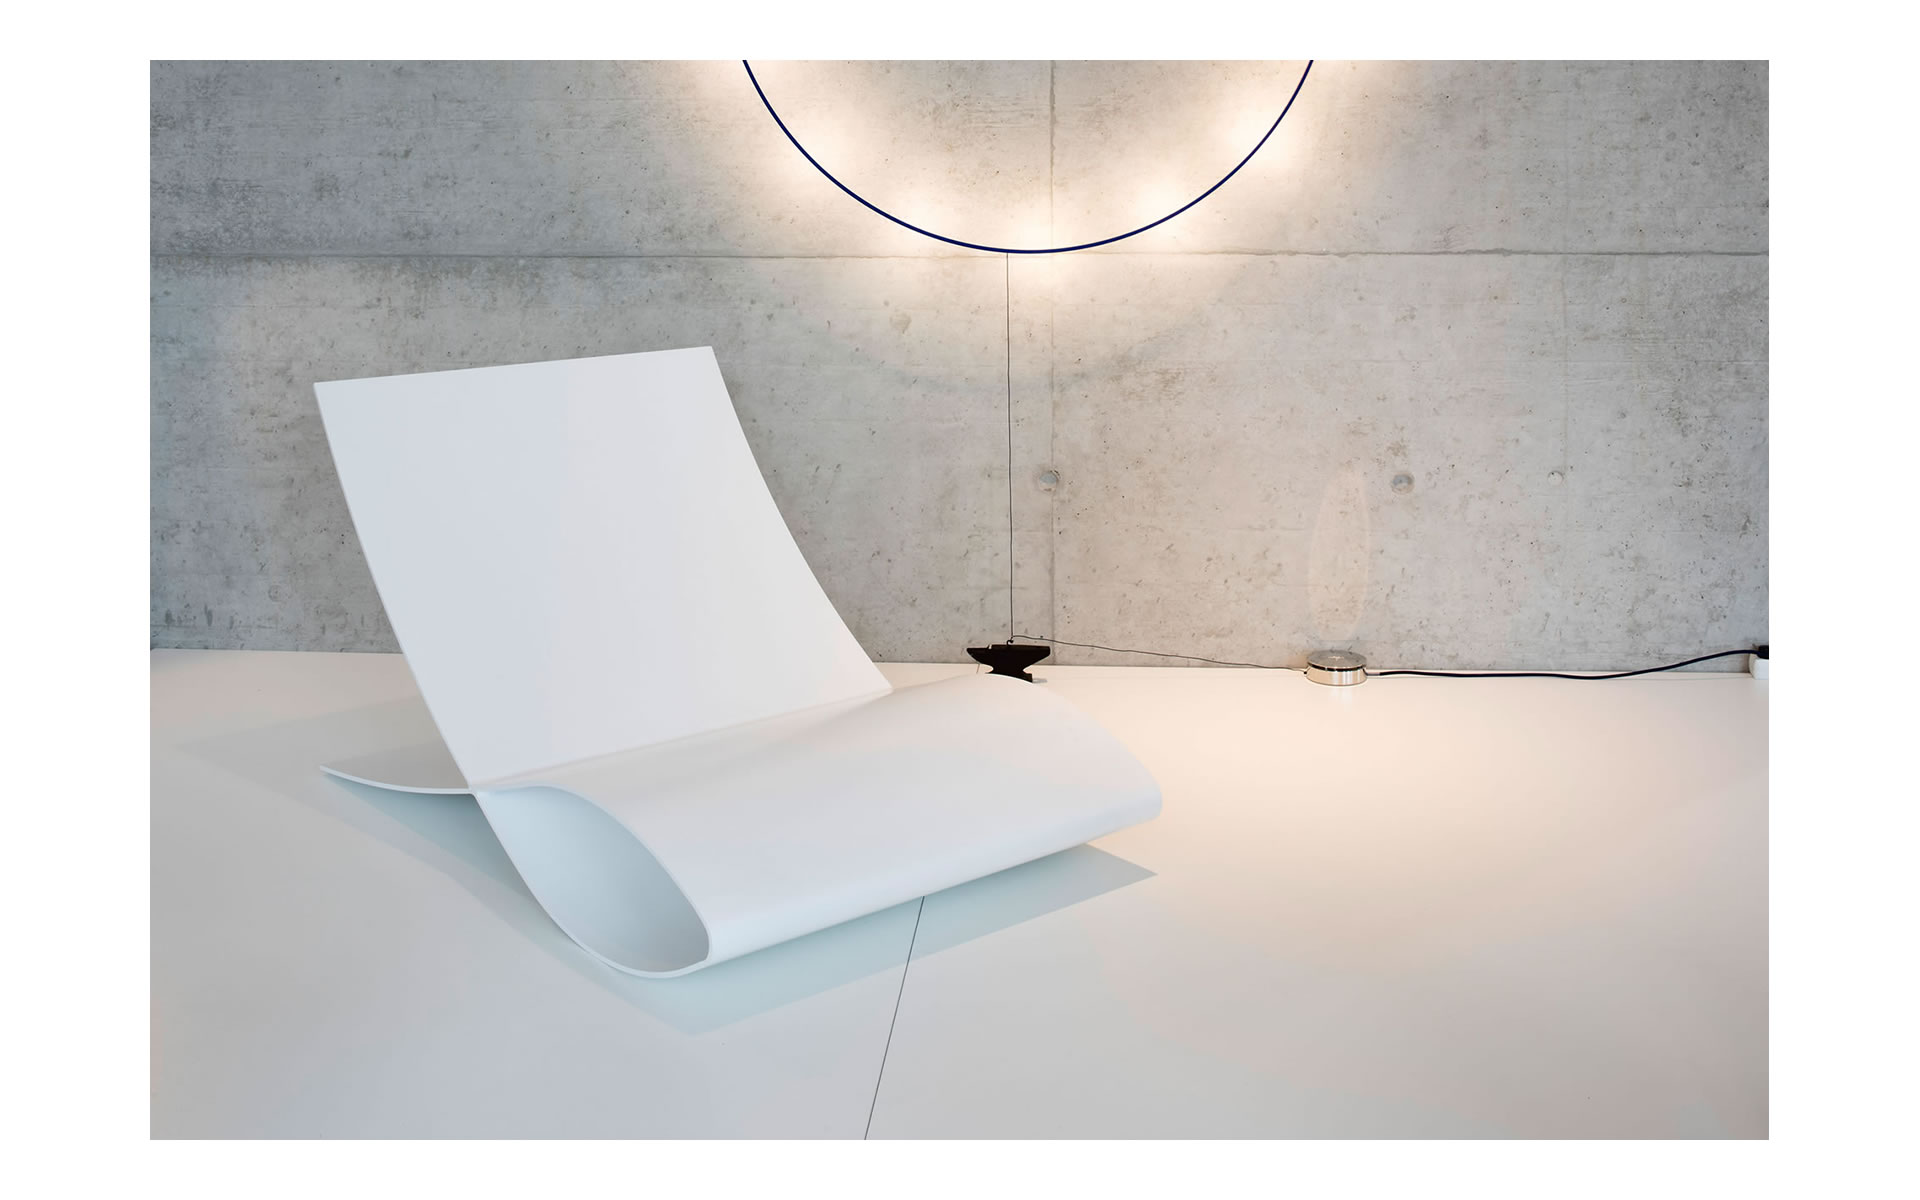 Attractive Sessel Modern Design Photo Of Weiss Hochglanz Lack Lounge Wartebereich Empfang Bsk